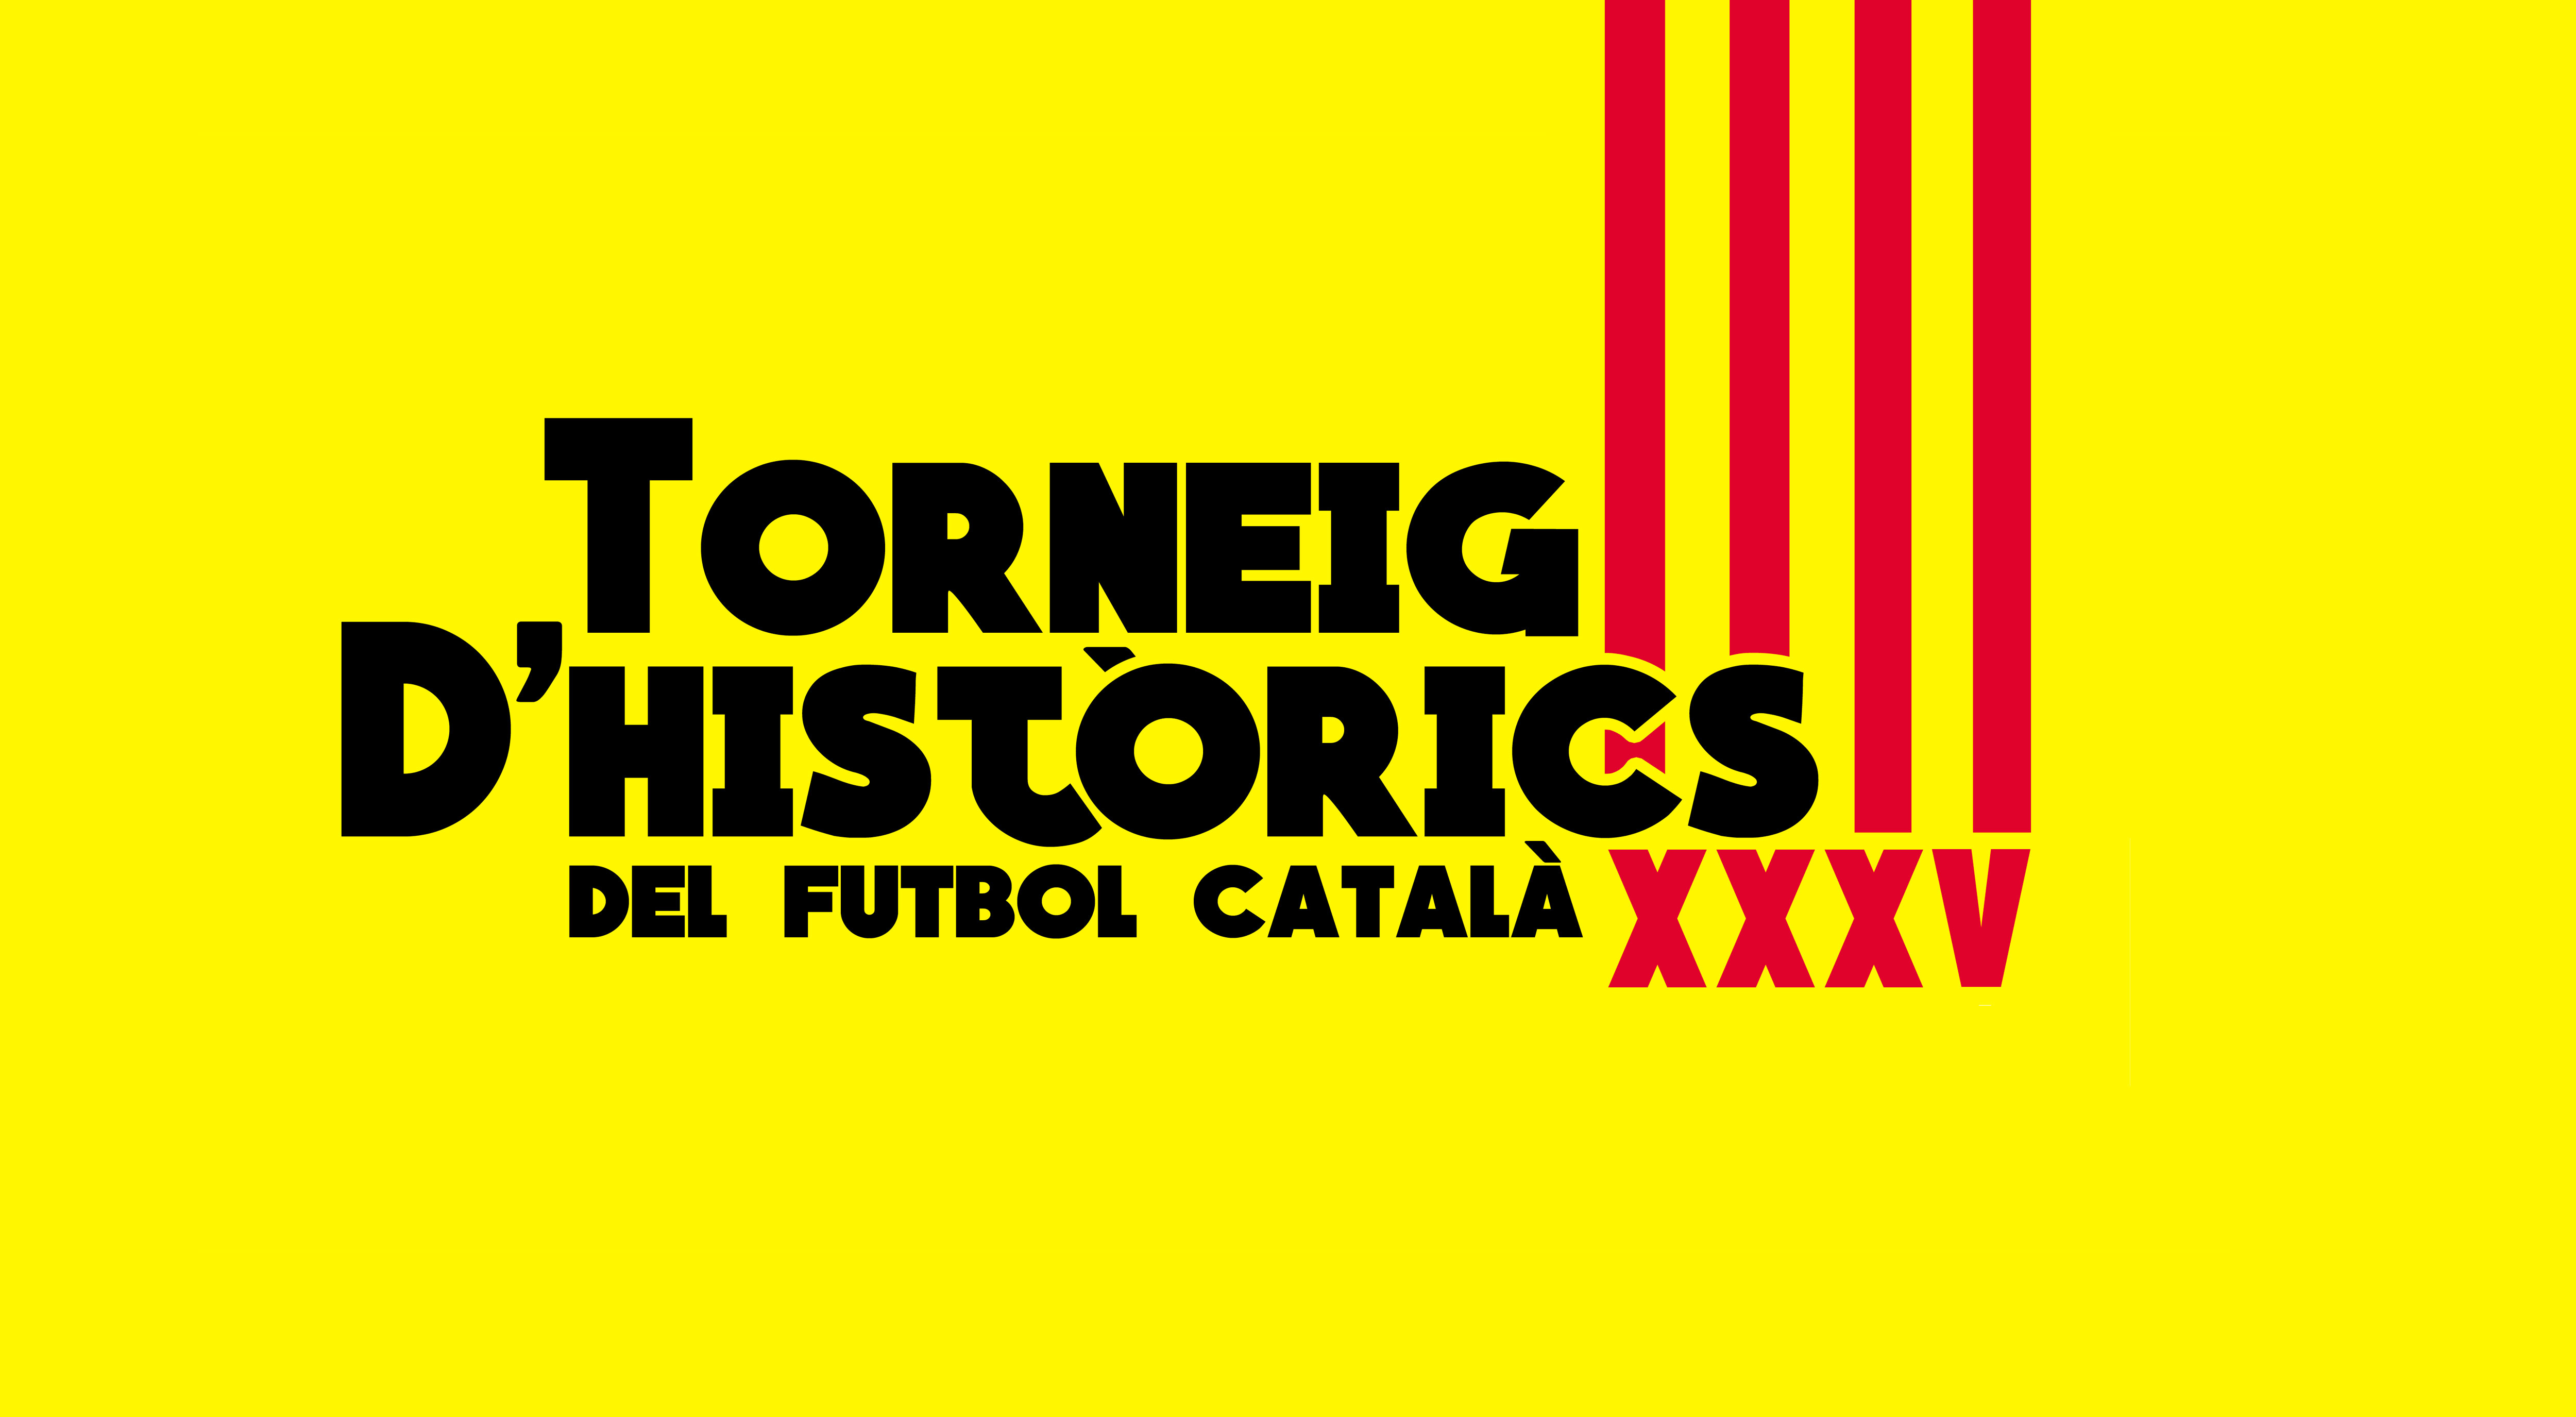 Torna L'Històrics!!